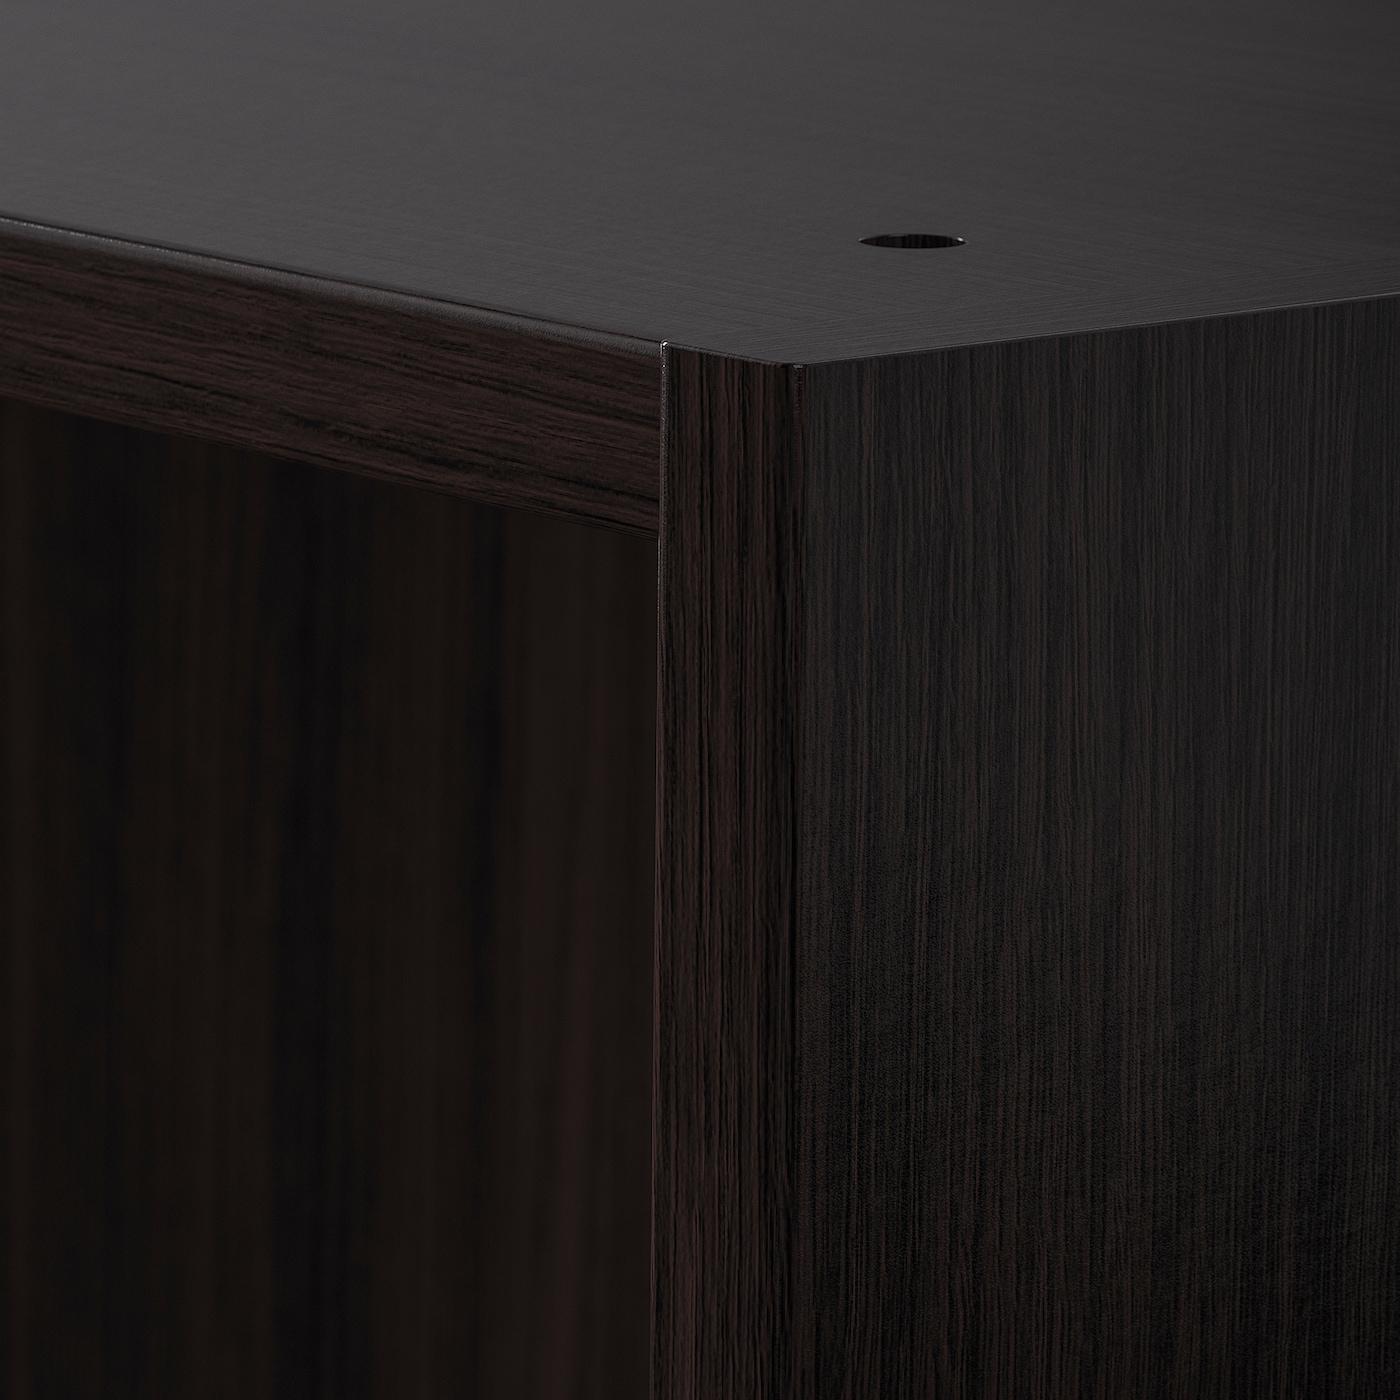 PAX Wardrobe frame, black-brown, 100x58x236 cm